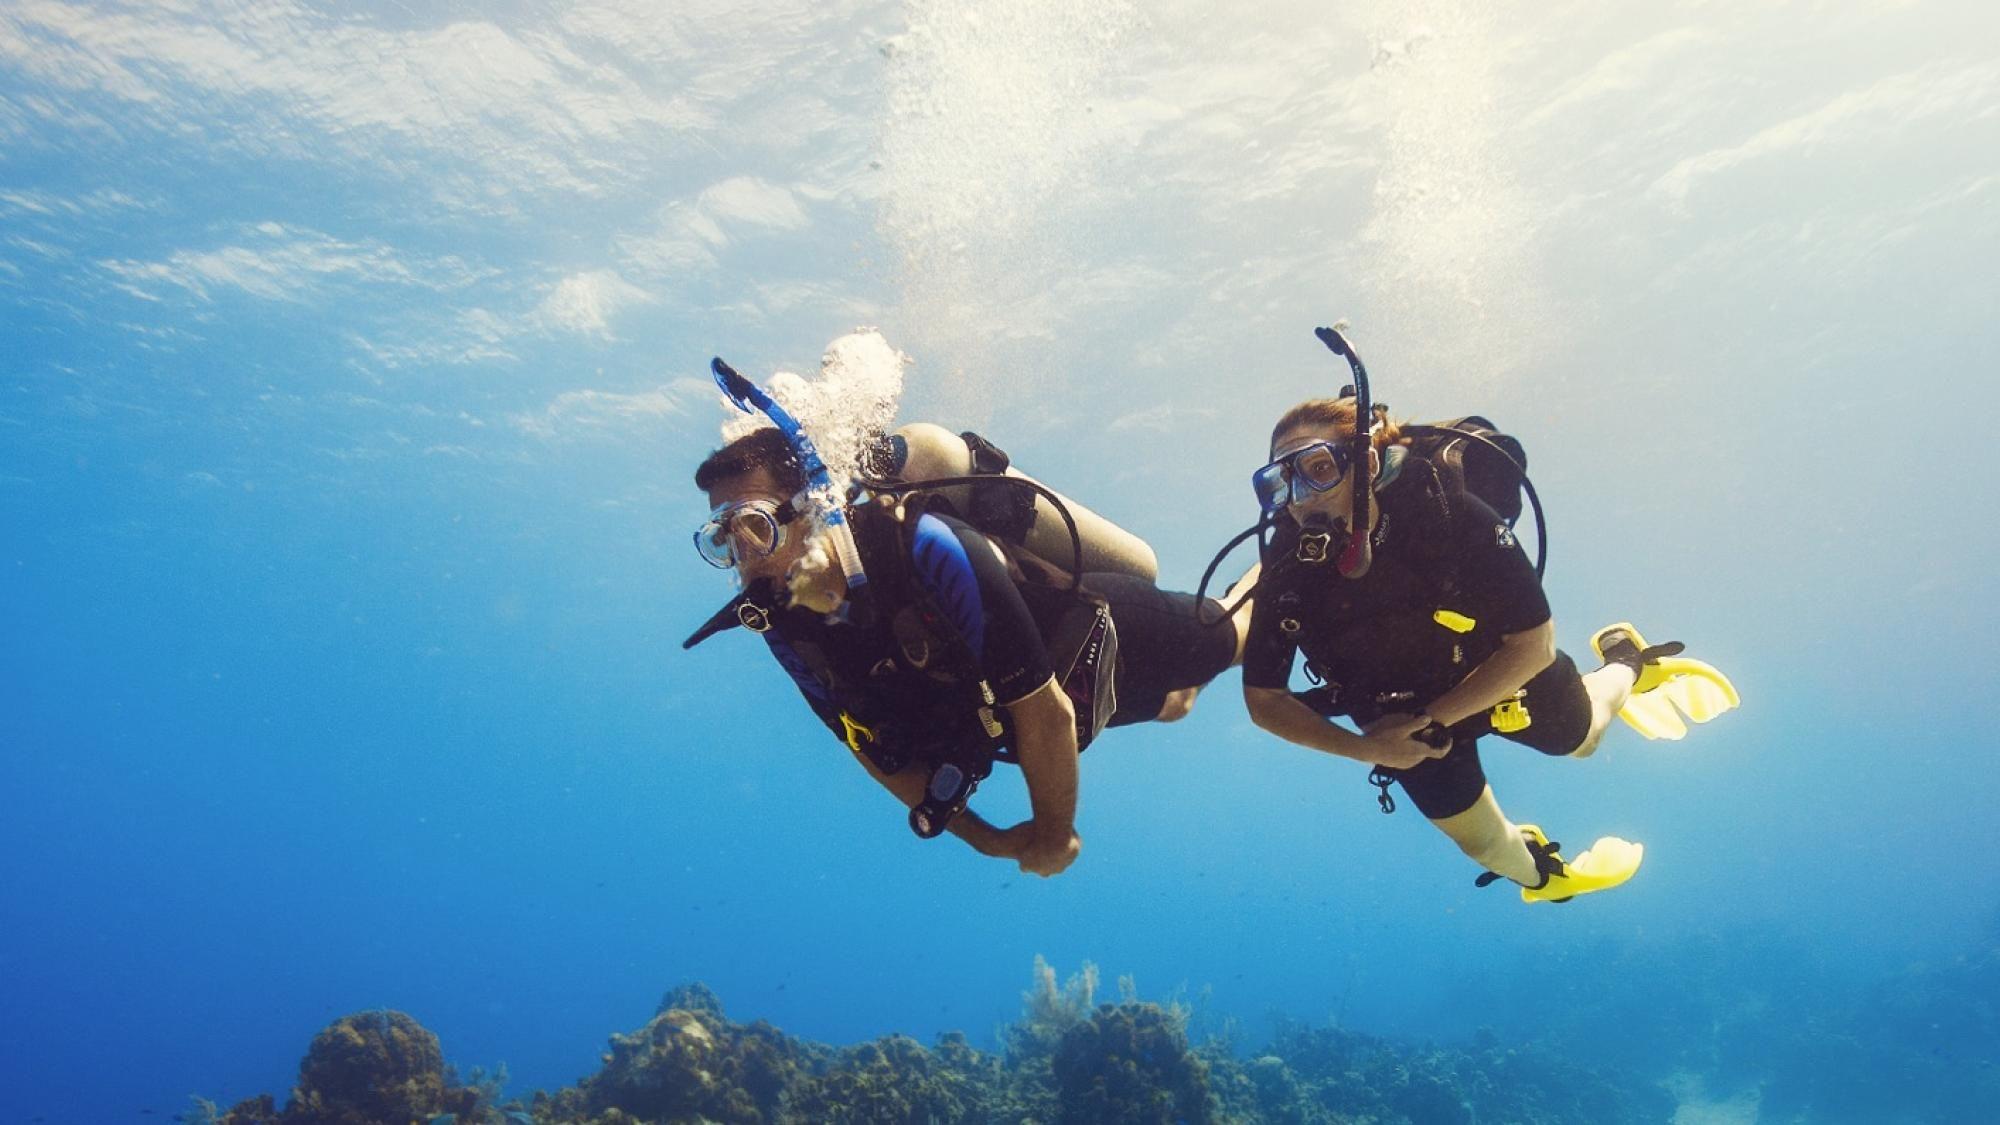 touristic-passport-scuba-diver-12-mt